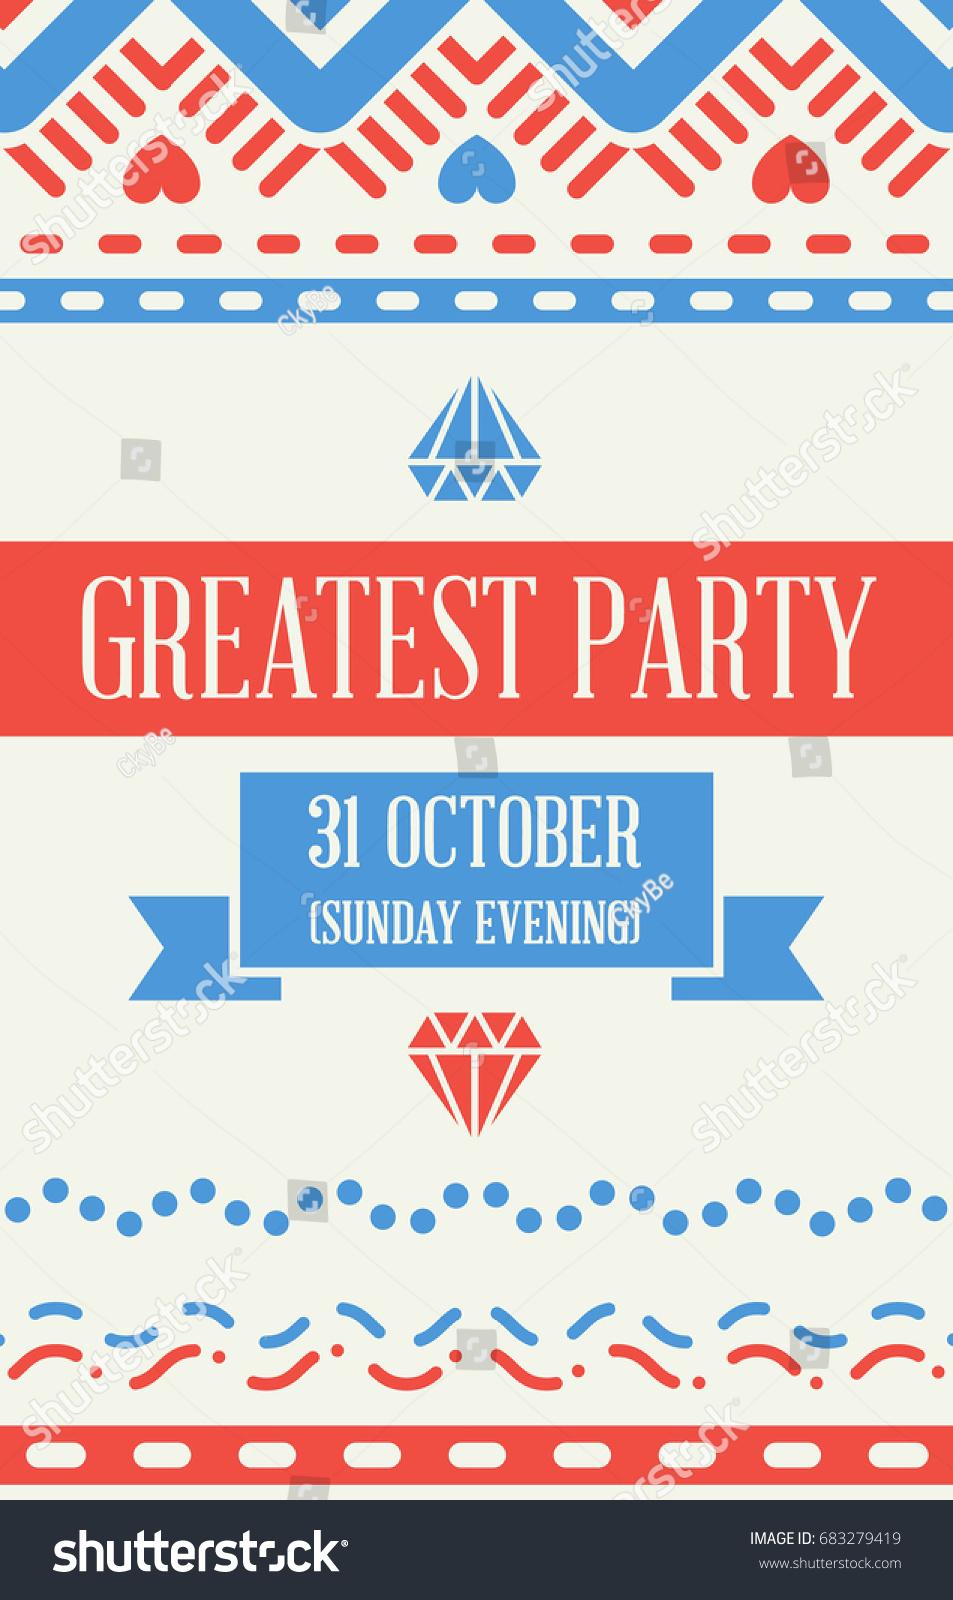 Raster Design Awesome Wedding Invitation Template Stock Illustration ...